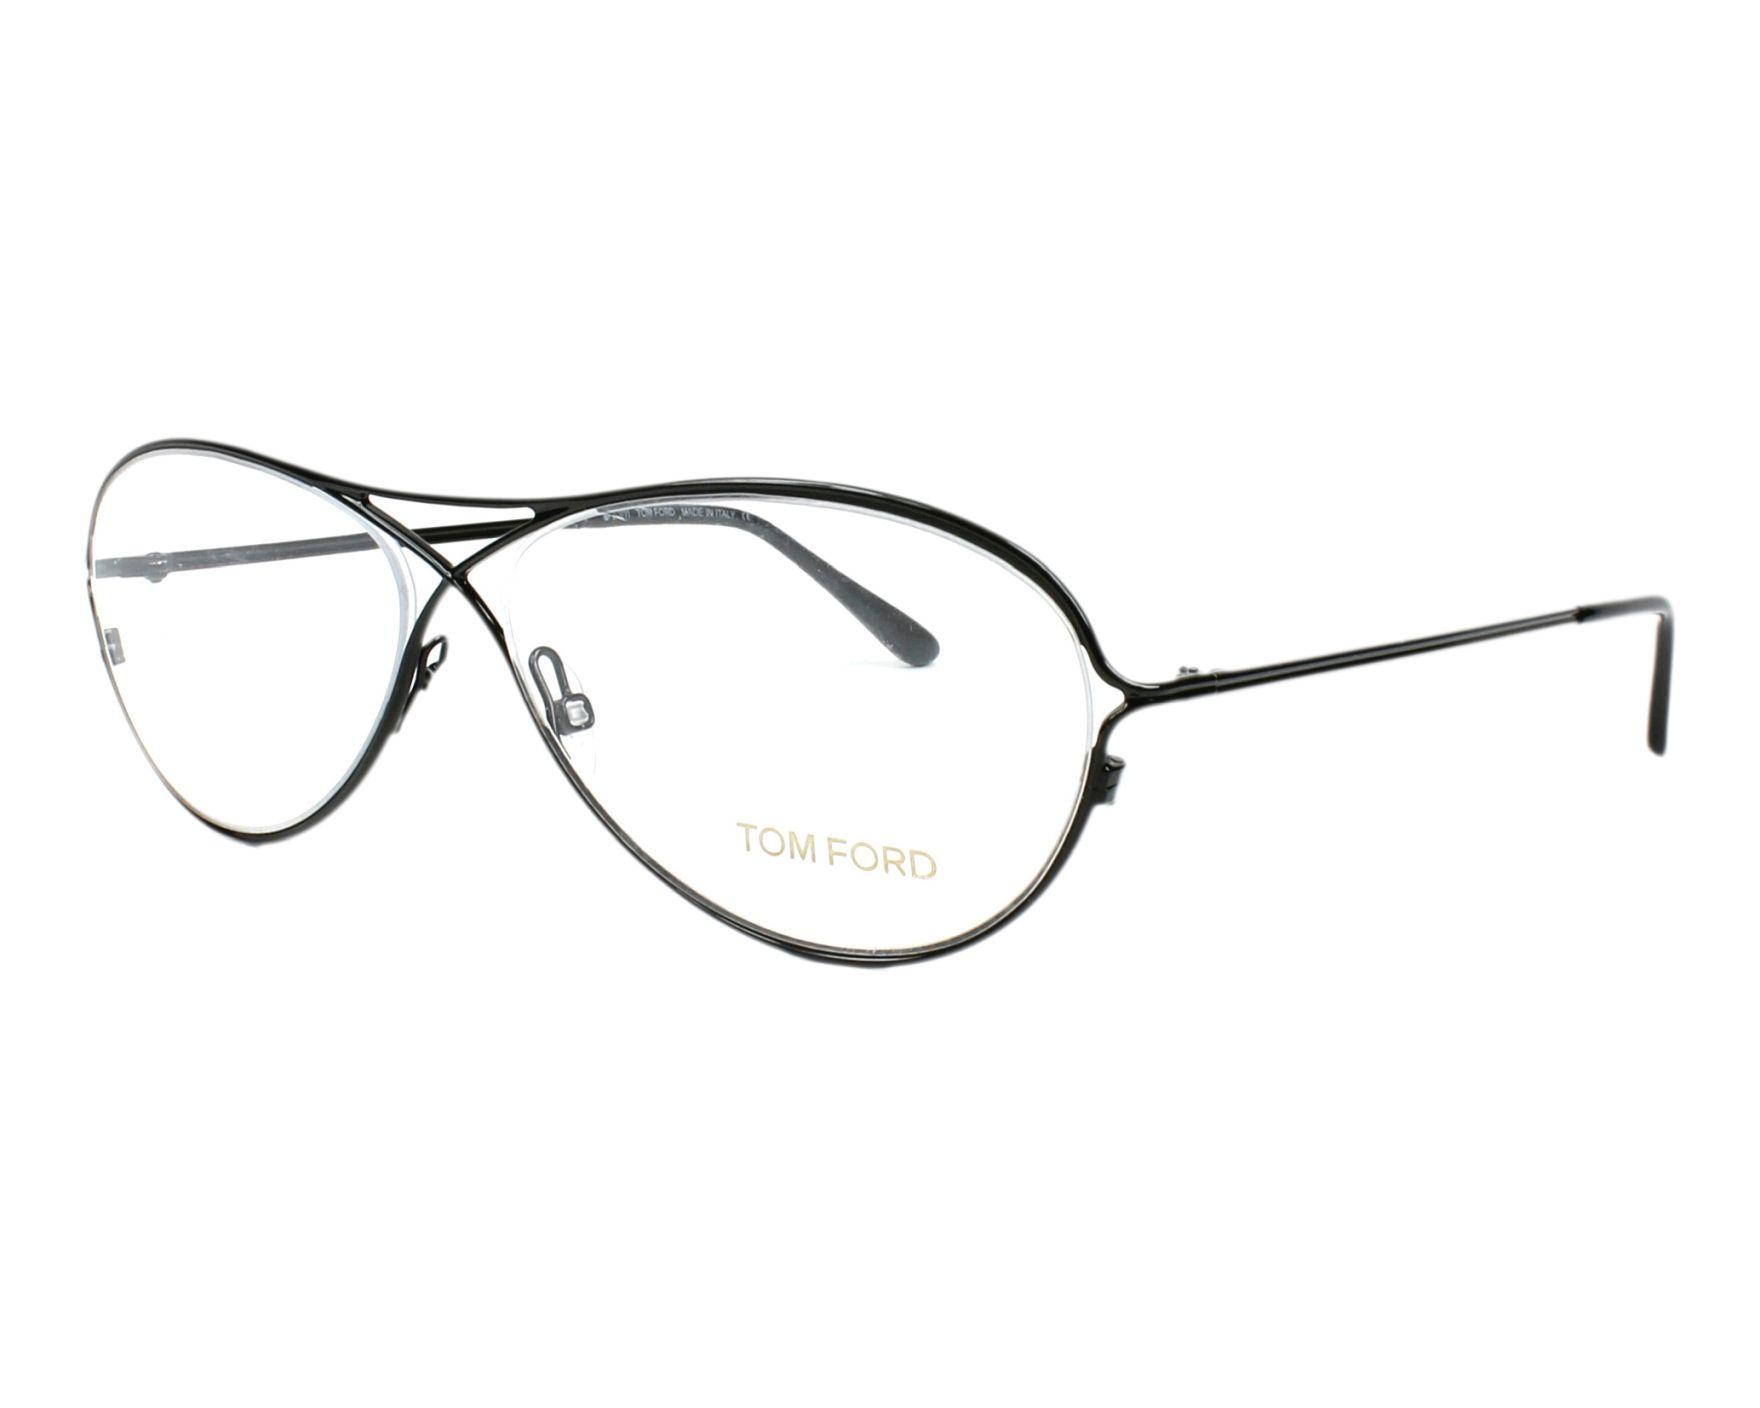 cf296752e7e8 Tom Ford - Buy Tom Ford eyeglasses online at low prices